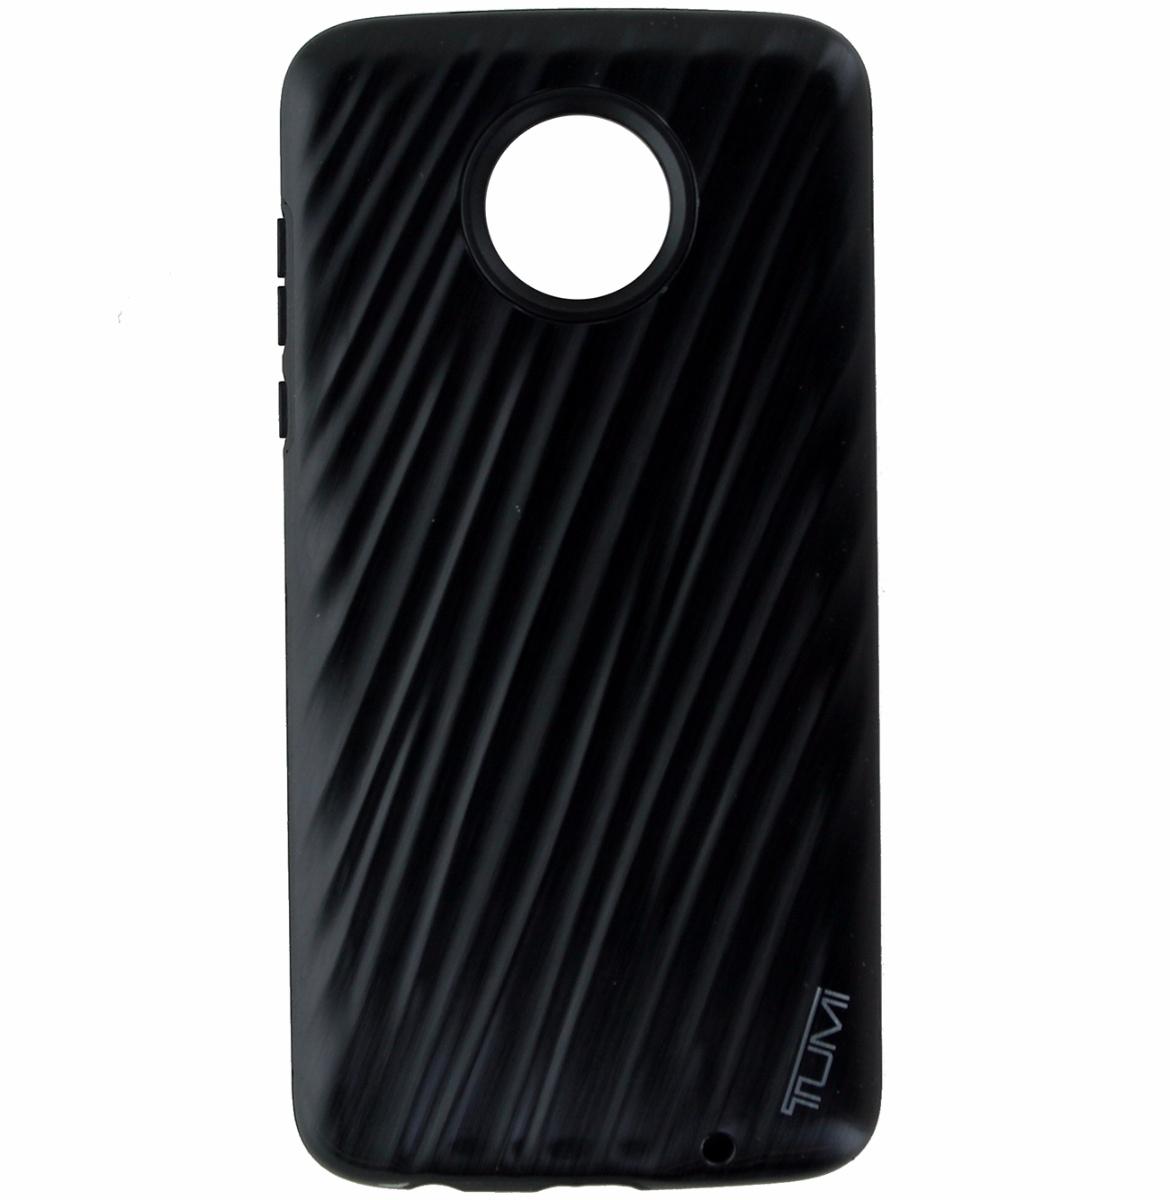 Tumi 19 Degree Series Hybrid Hard Case For Motorola Moto Z2 Play - Black